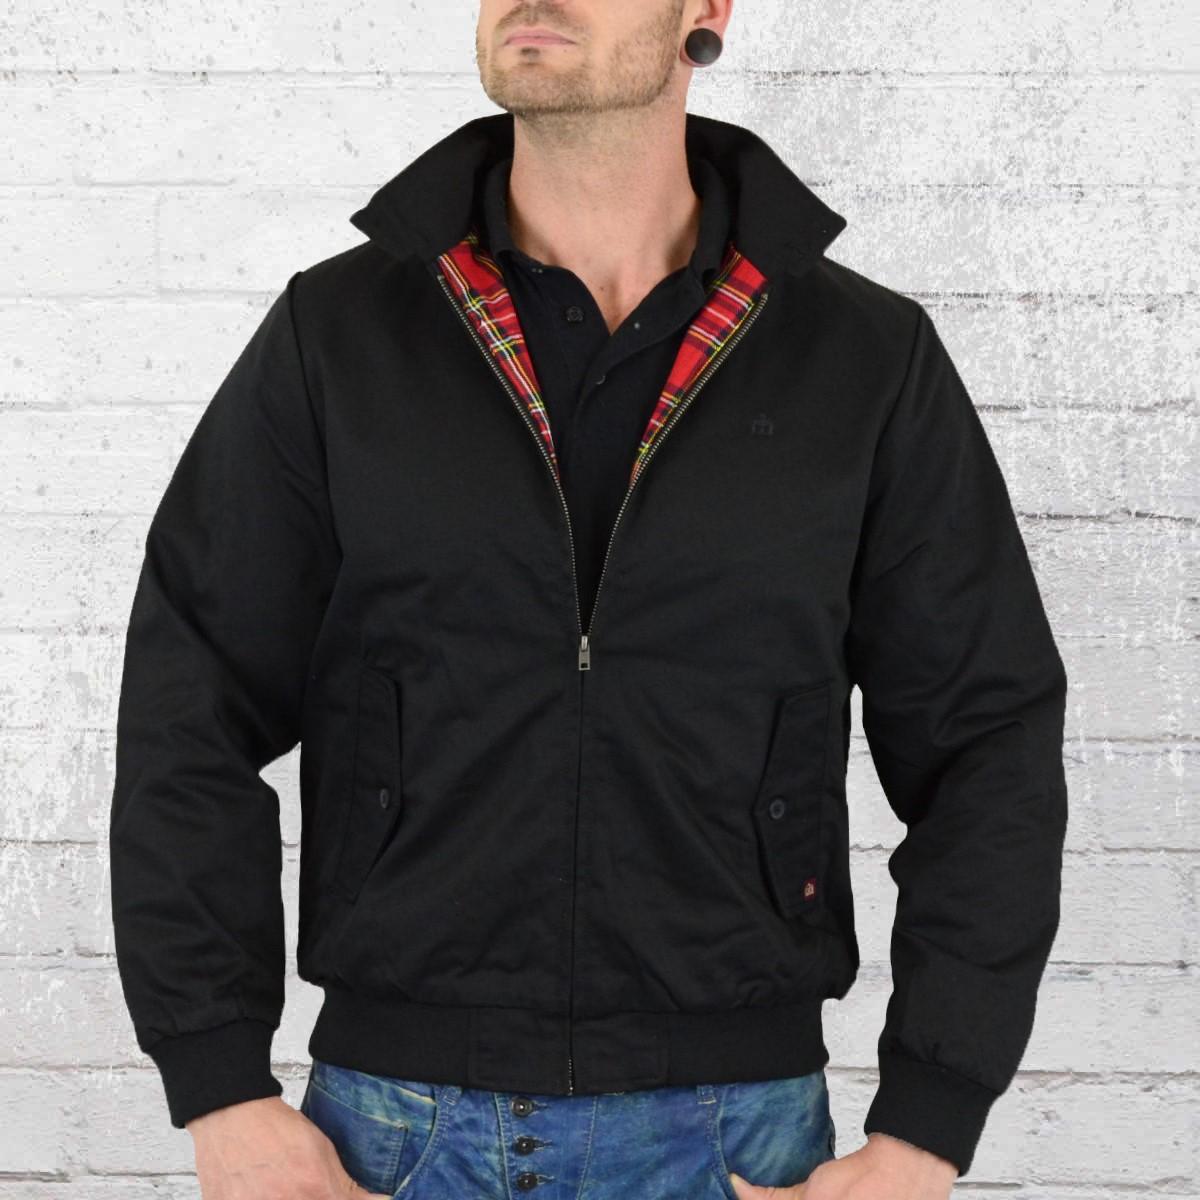 Order London Jacket Men NowMerc Harrington Black Yf6gb7y